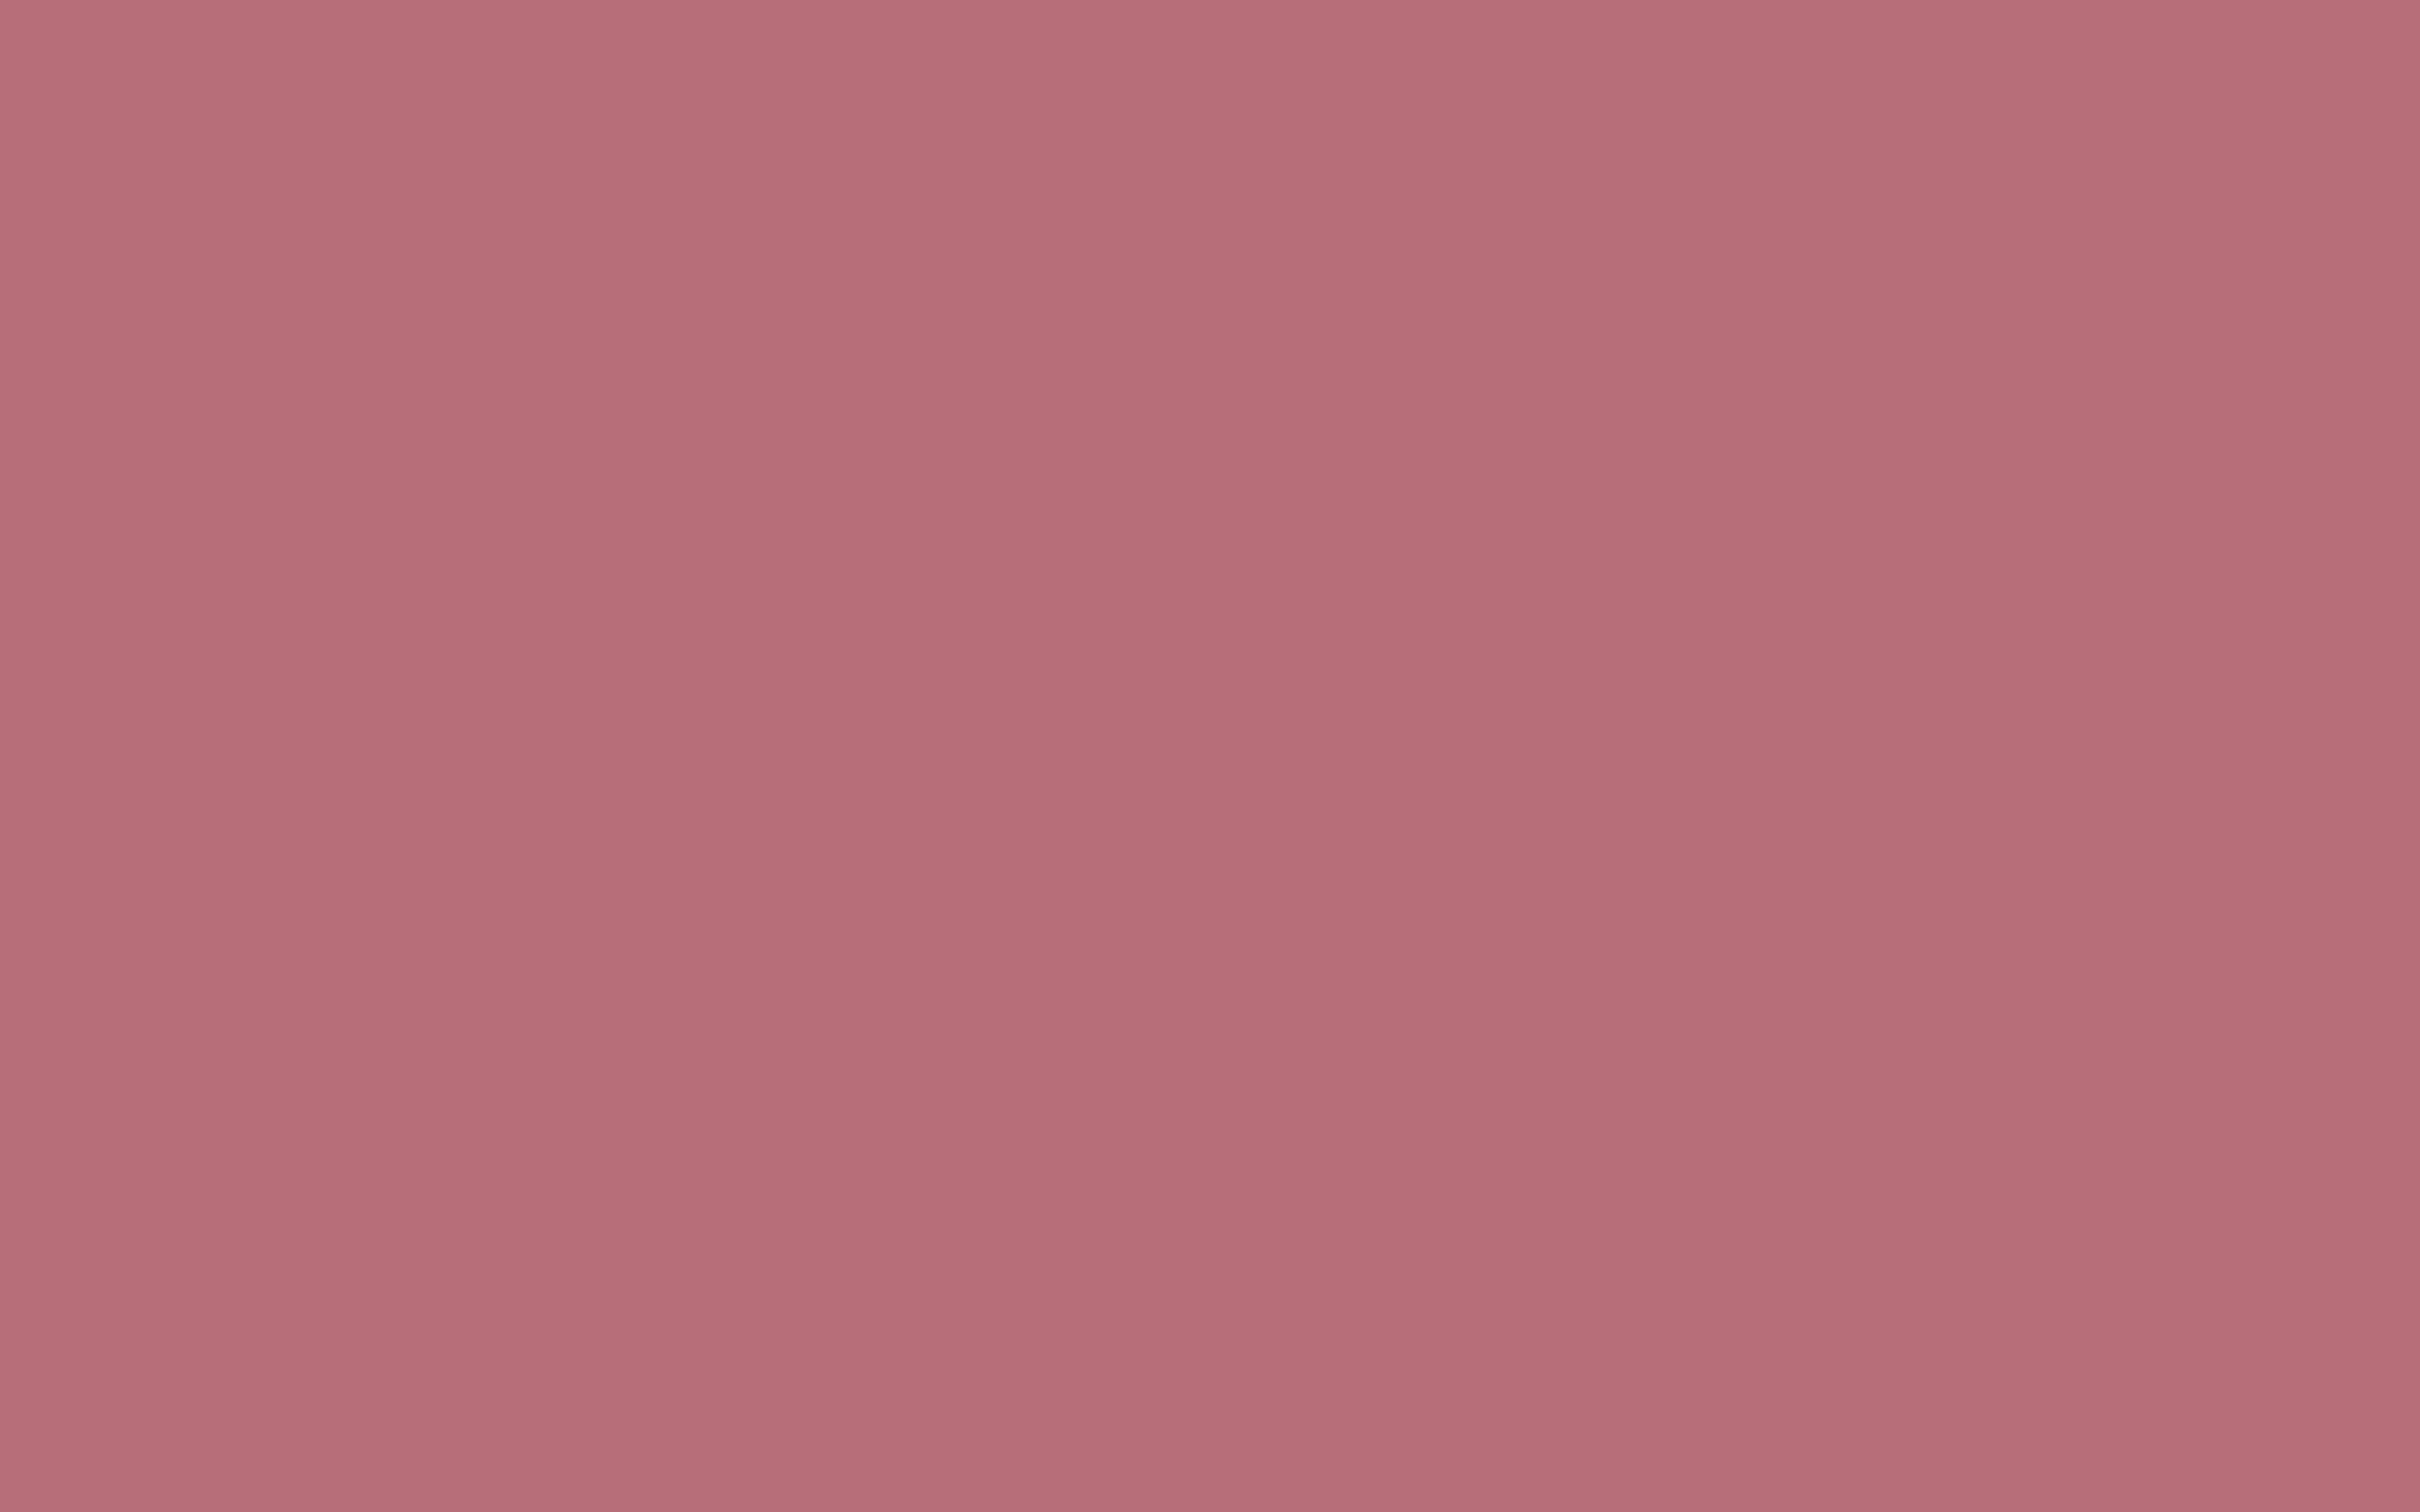 2560x1600 Rose Gold Solid Color Background